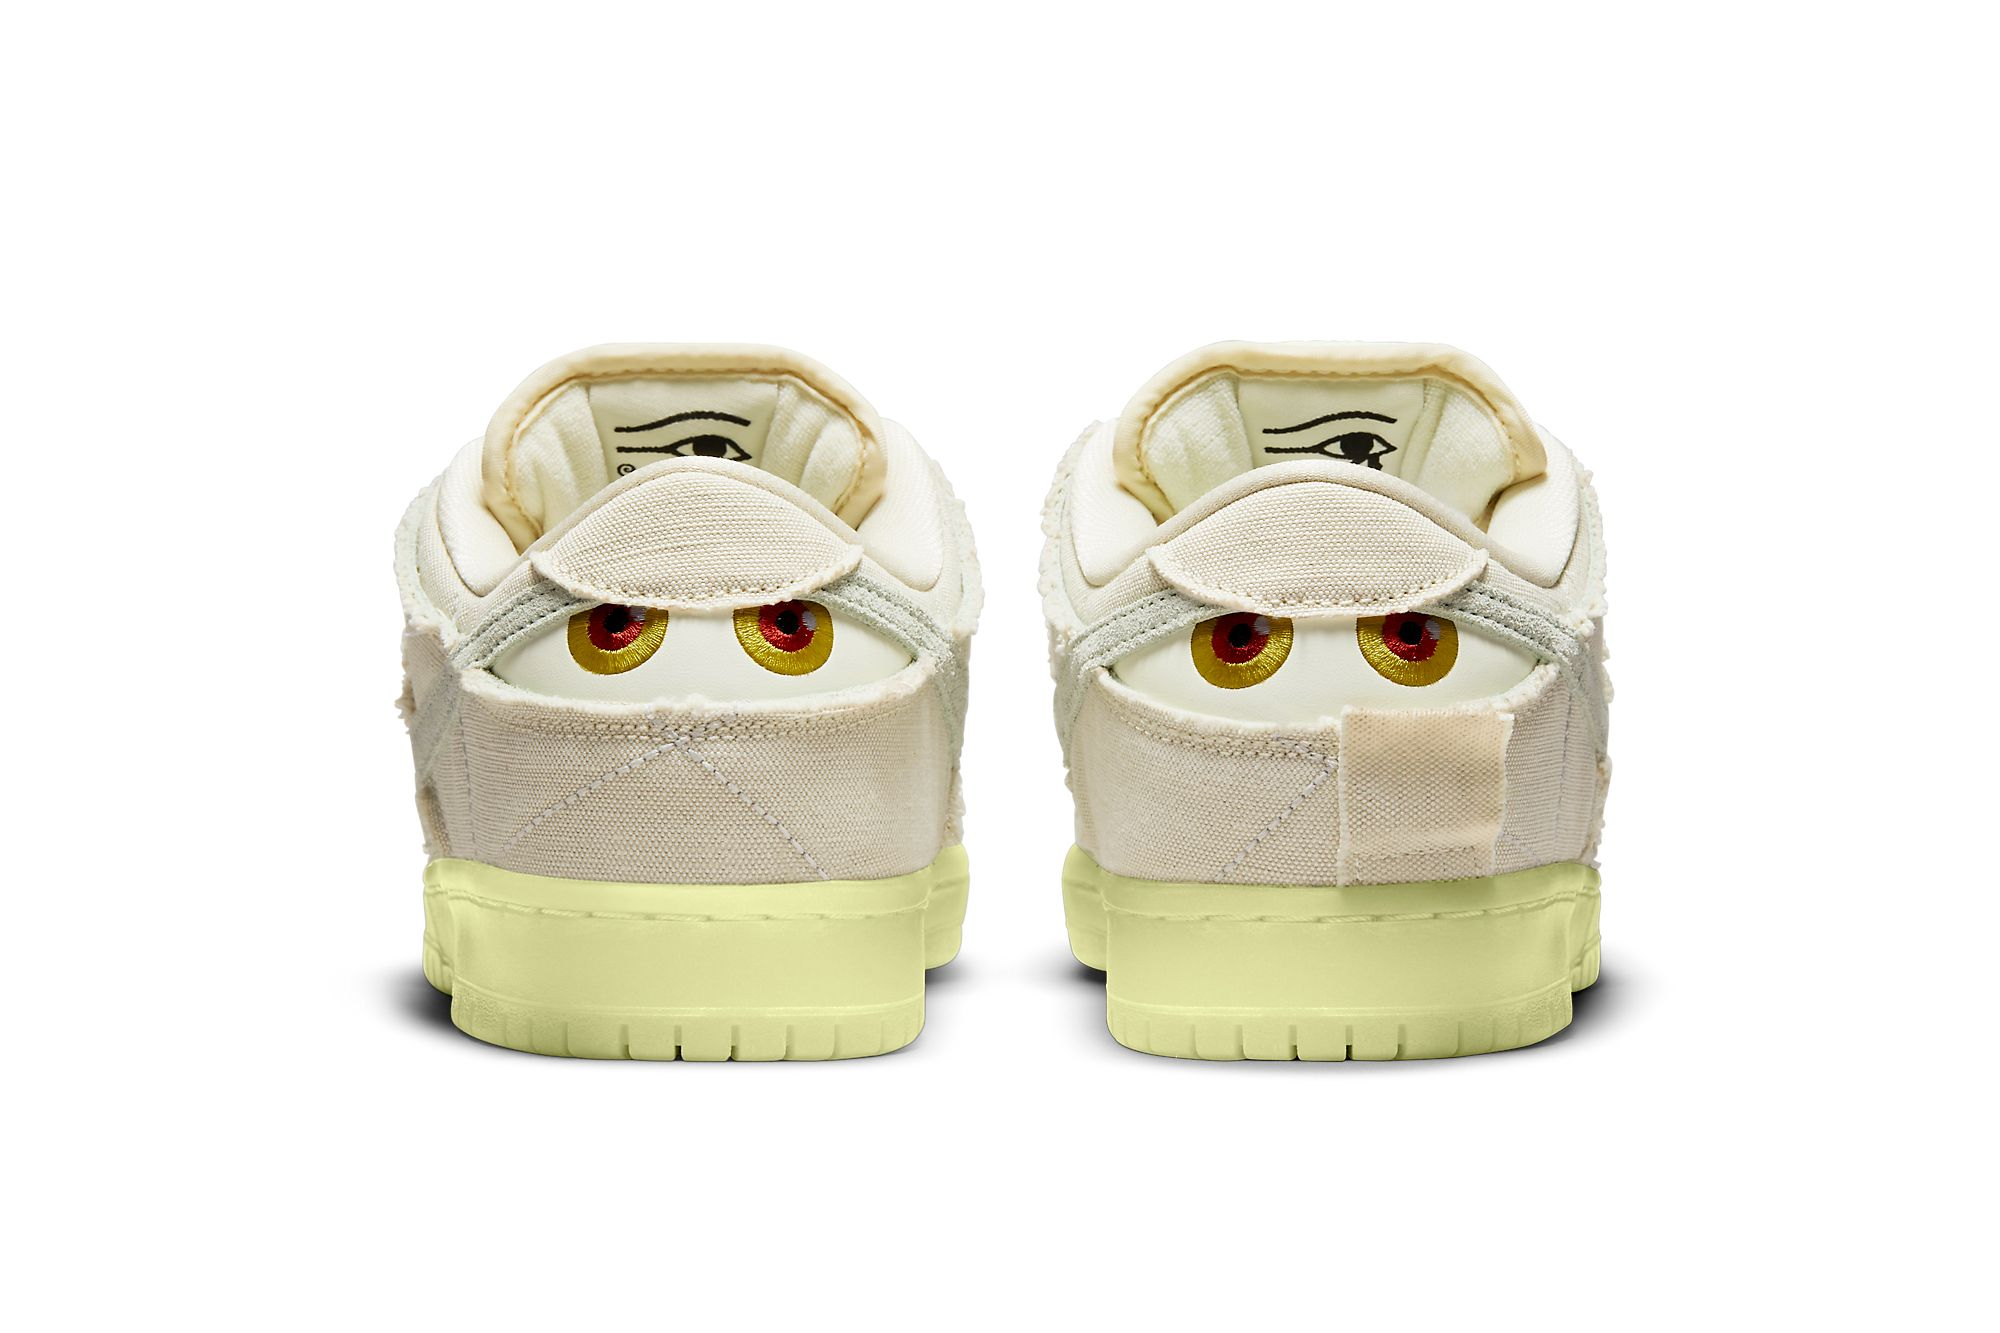 Nike SB Dunk Low 'Mummy'